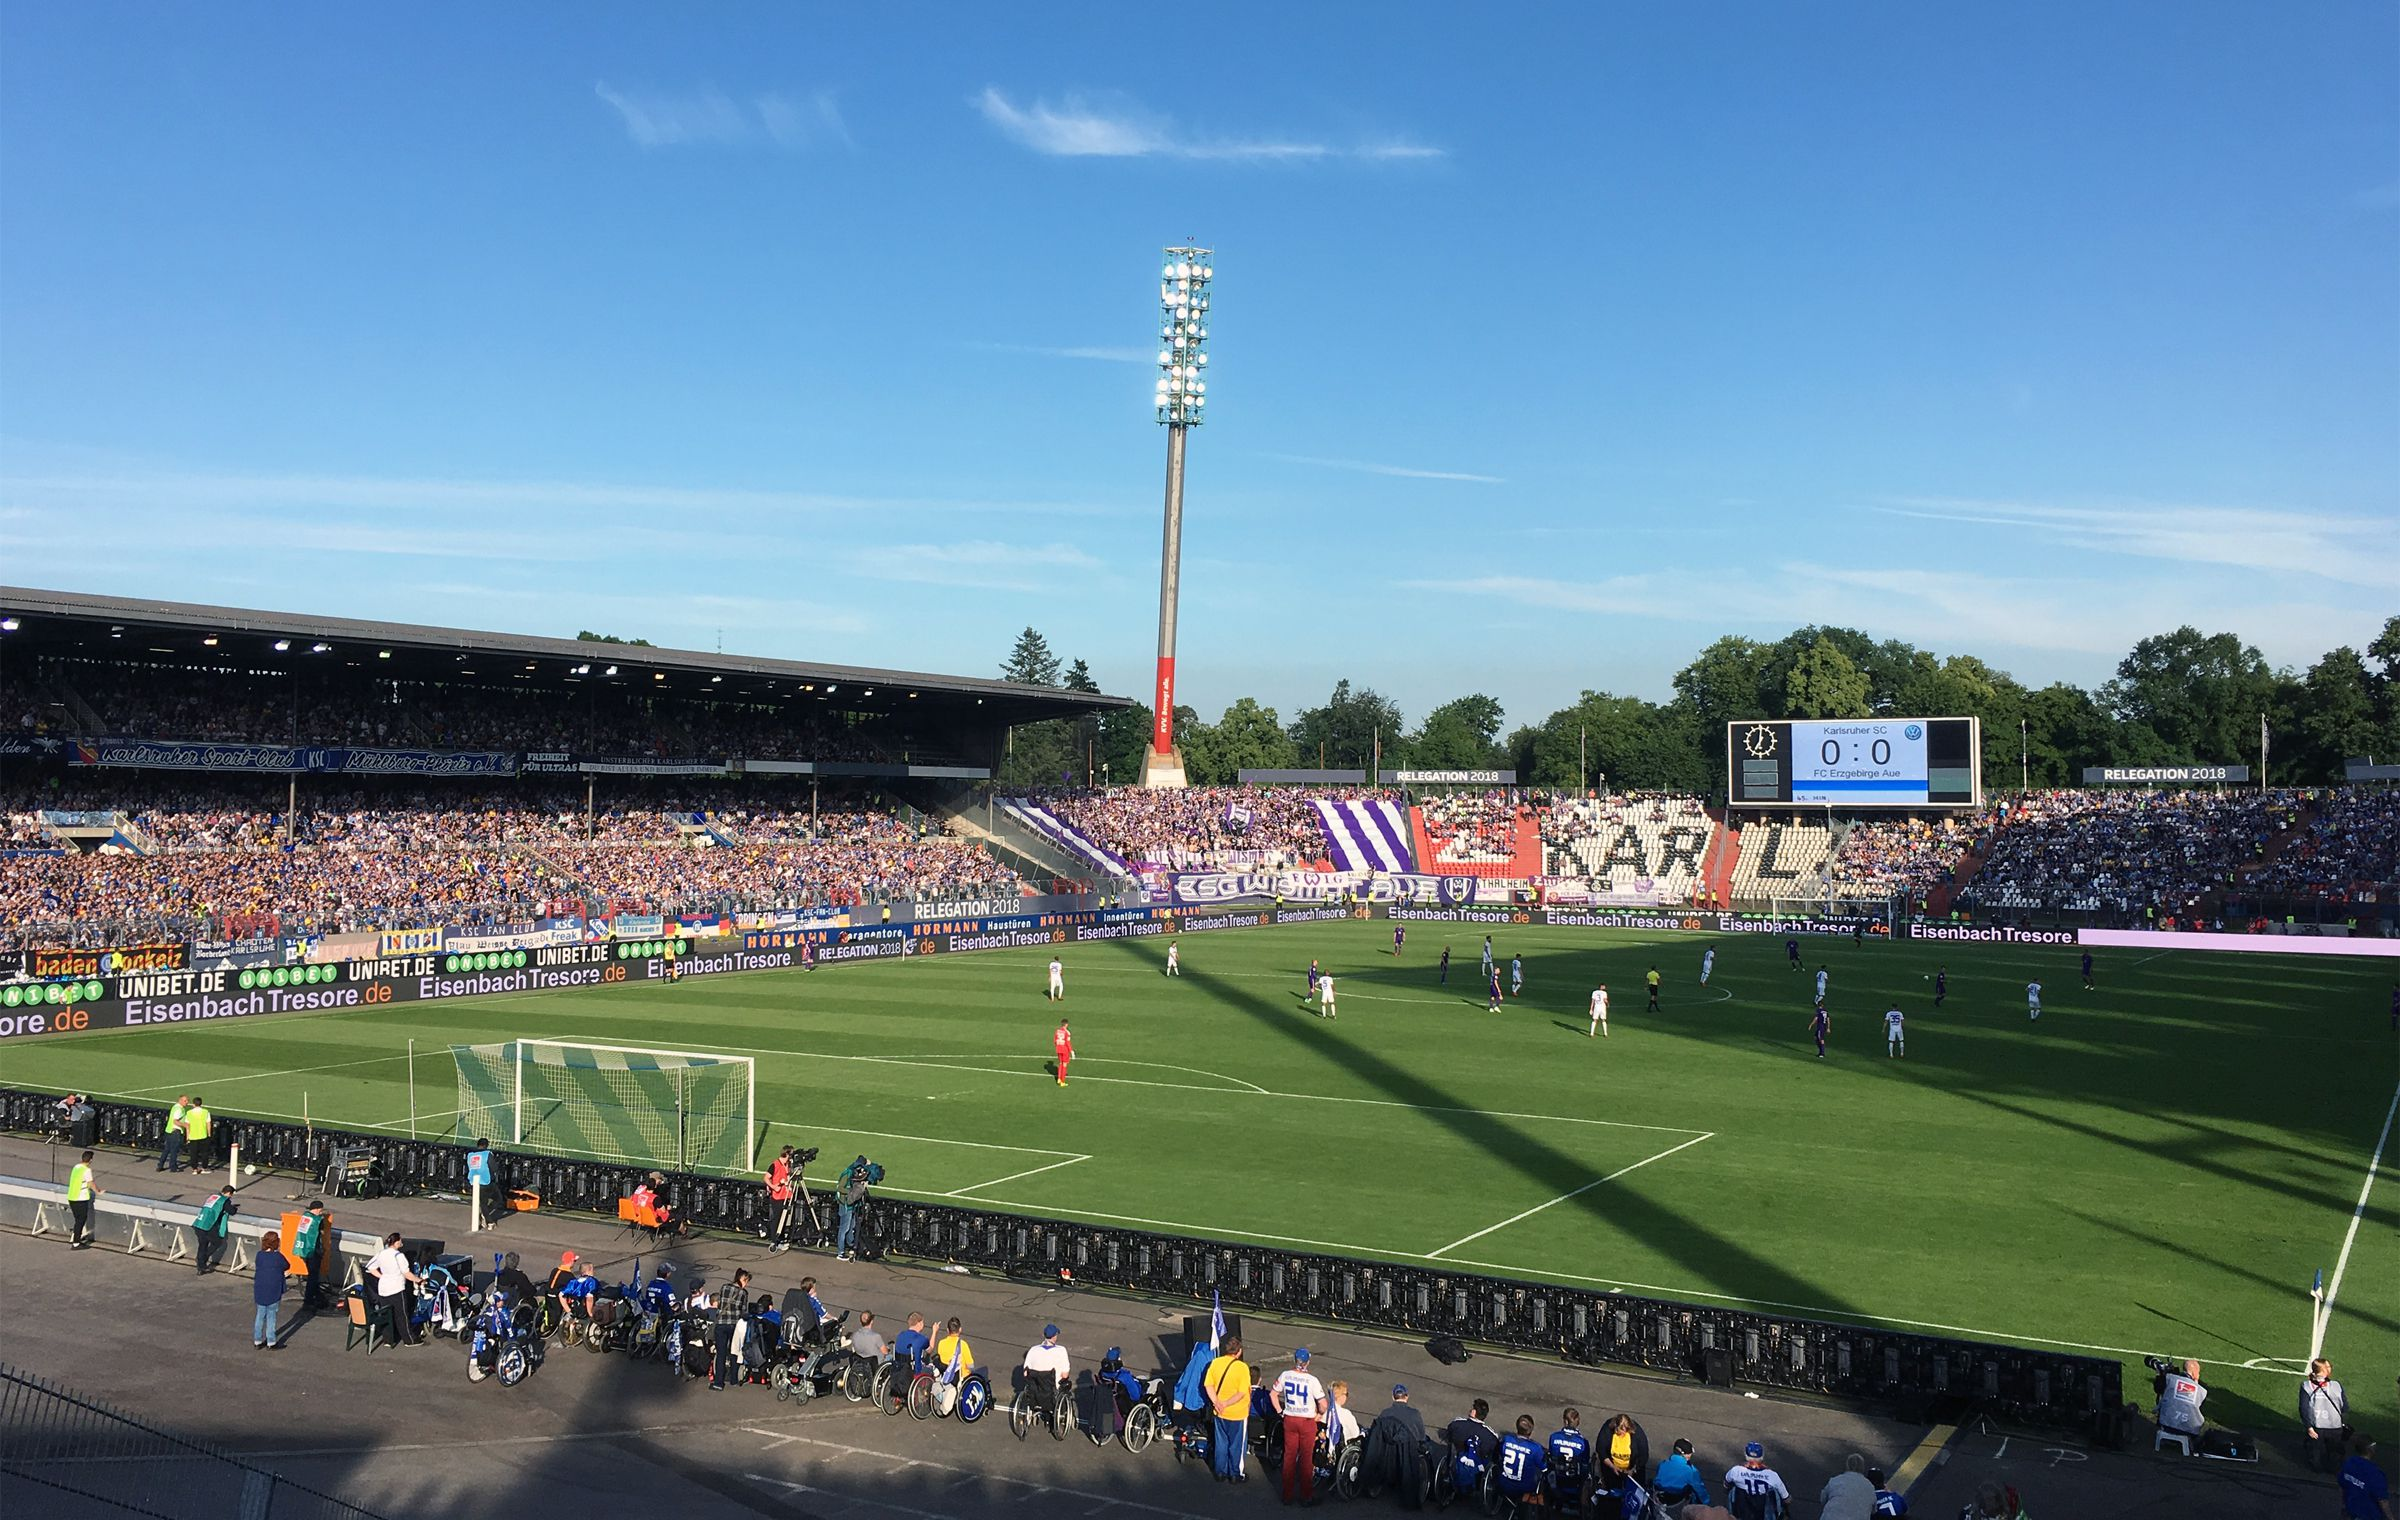 KSC vs FC Erzgebirge Aue 0:0